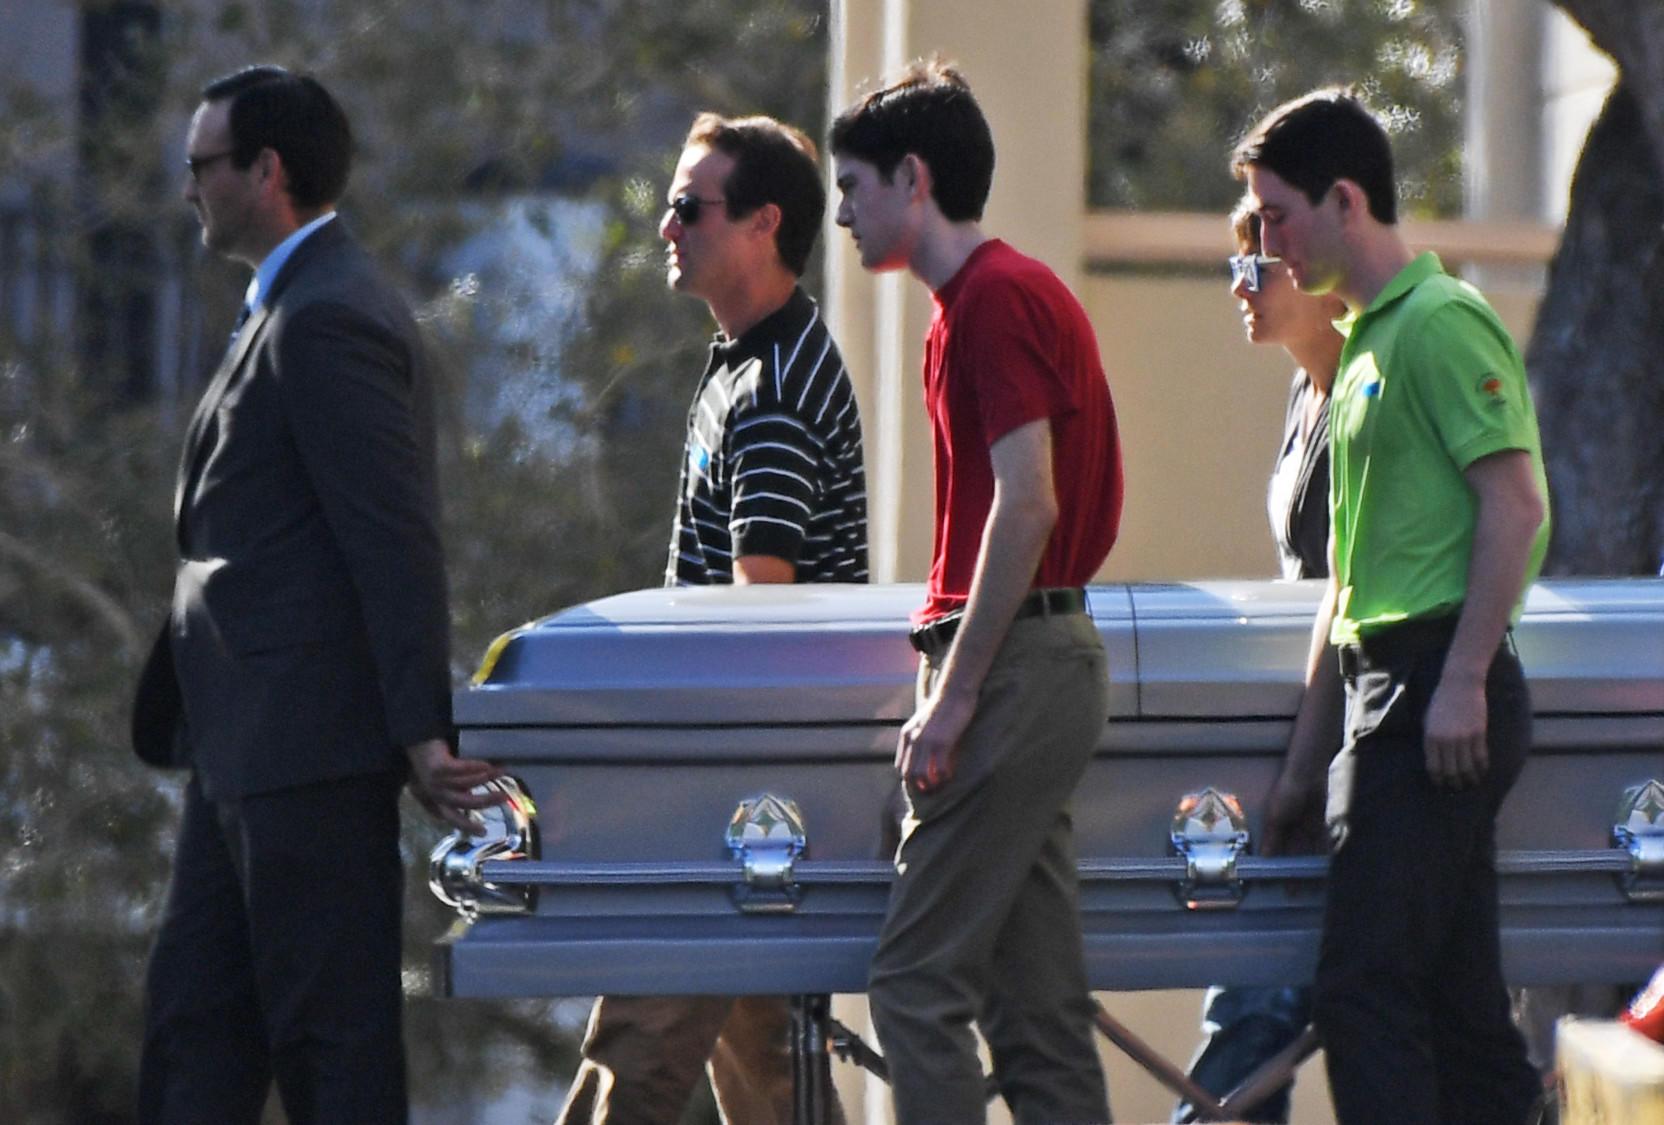 Scott Beigel Who Saved Students In Florida School